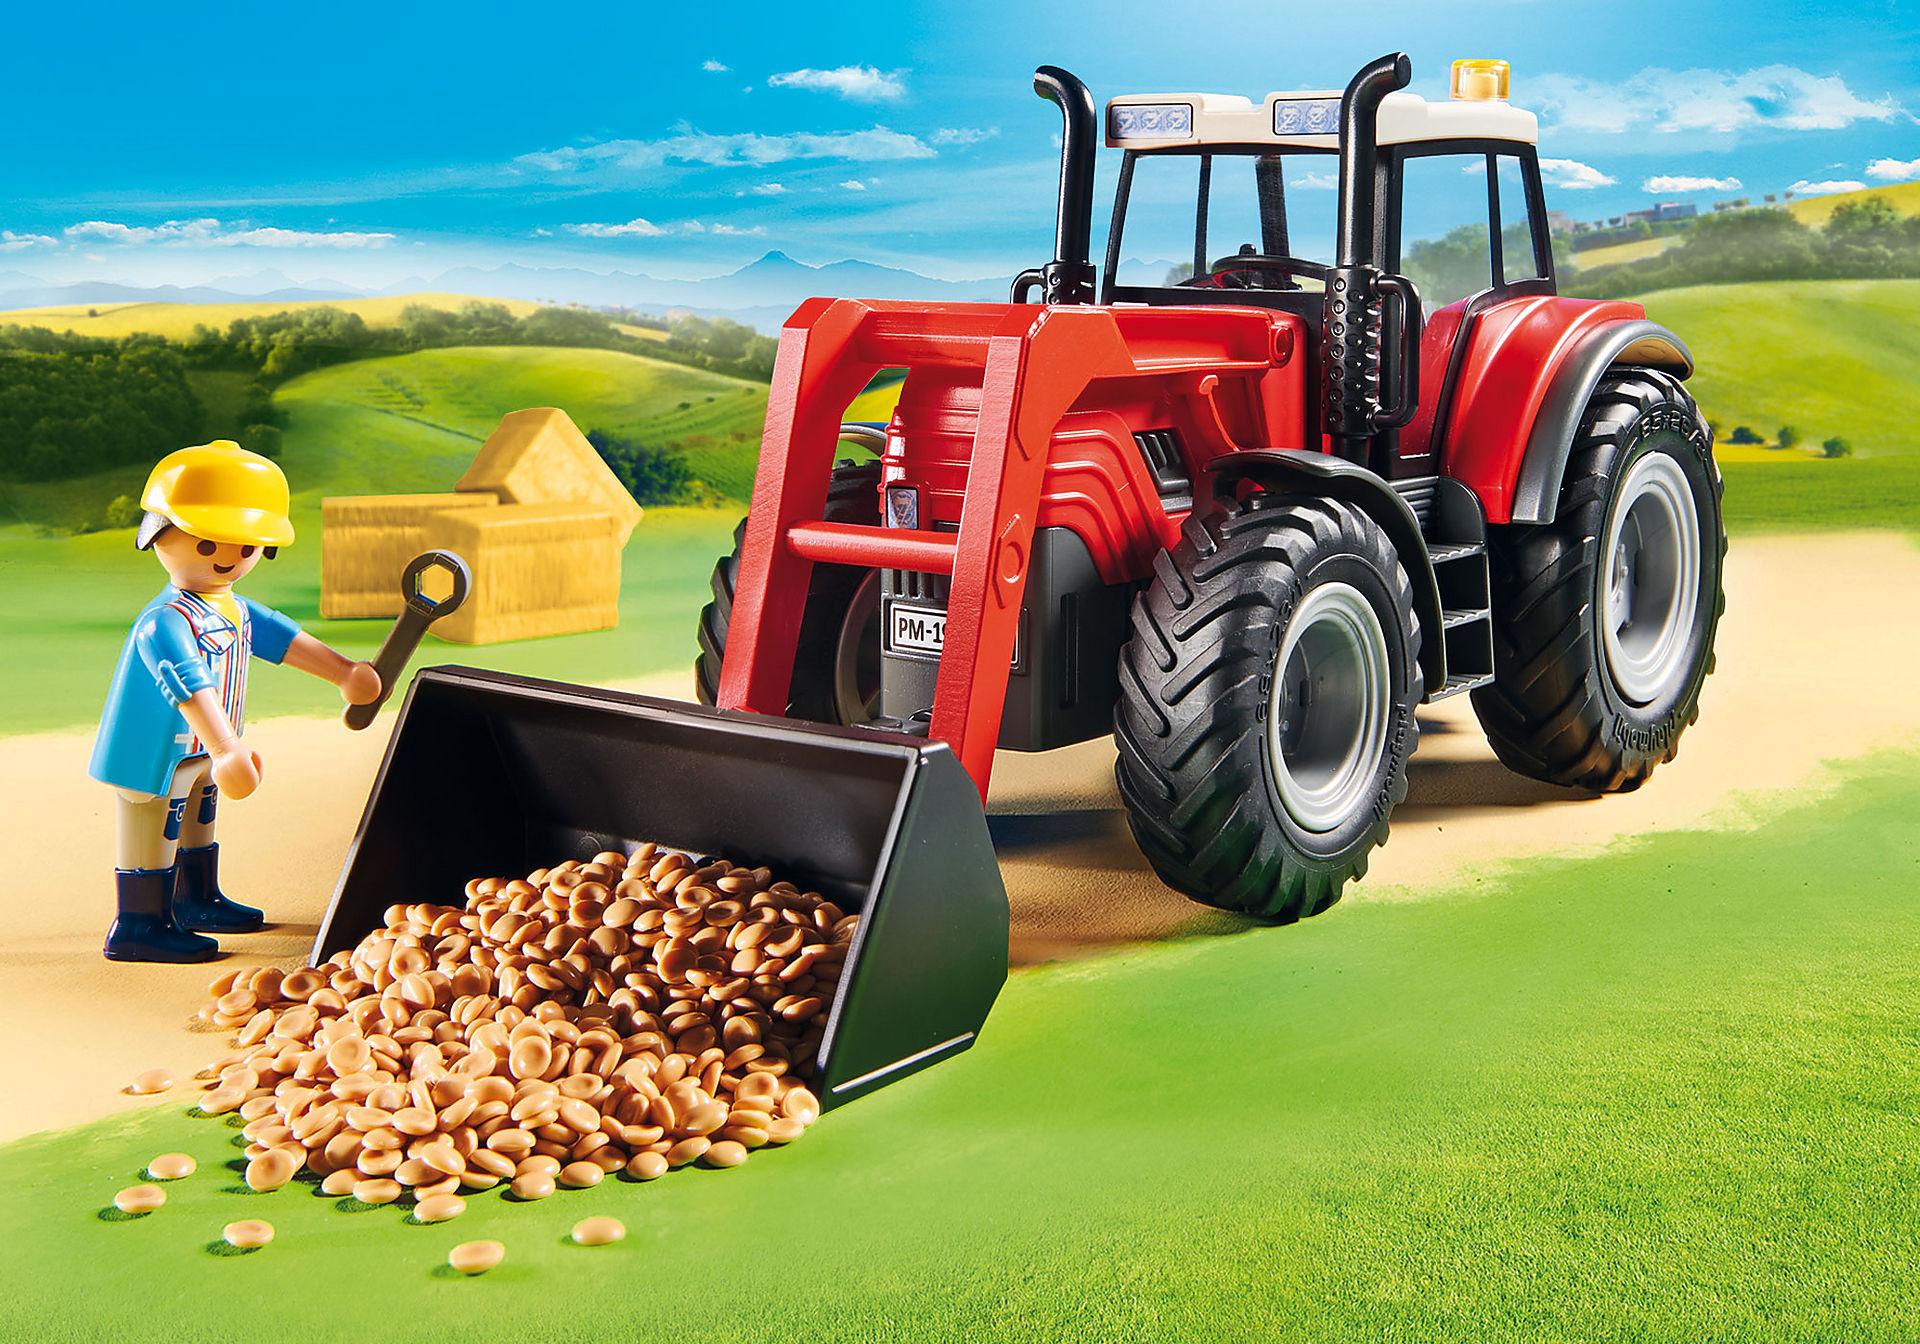 70131 Grand tracteur avec remorque zoom image4